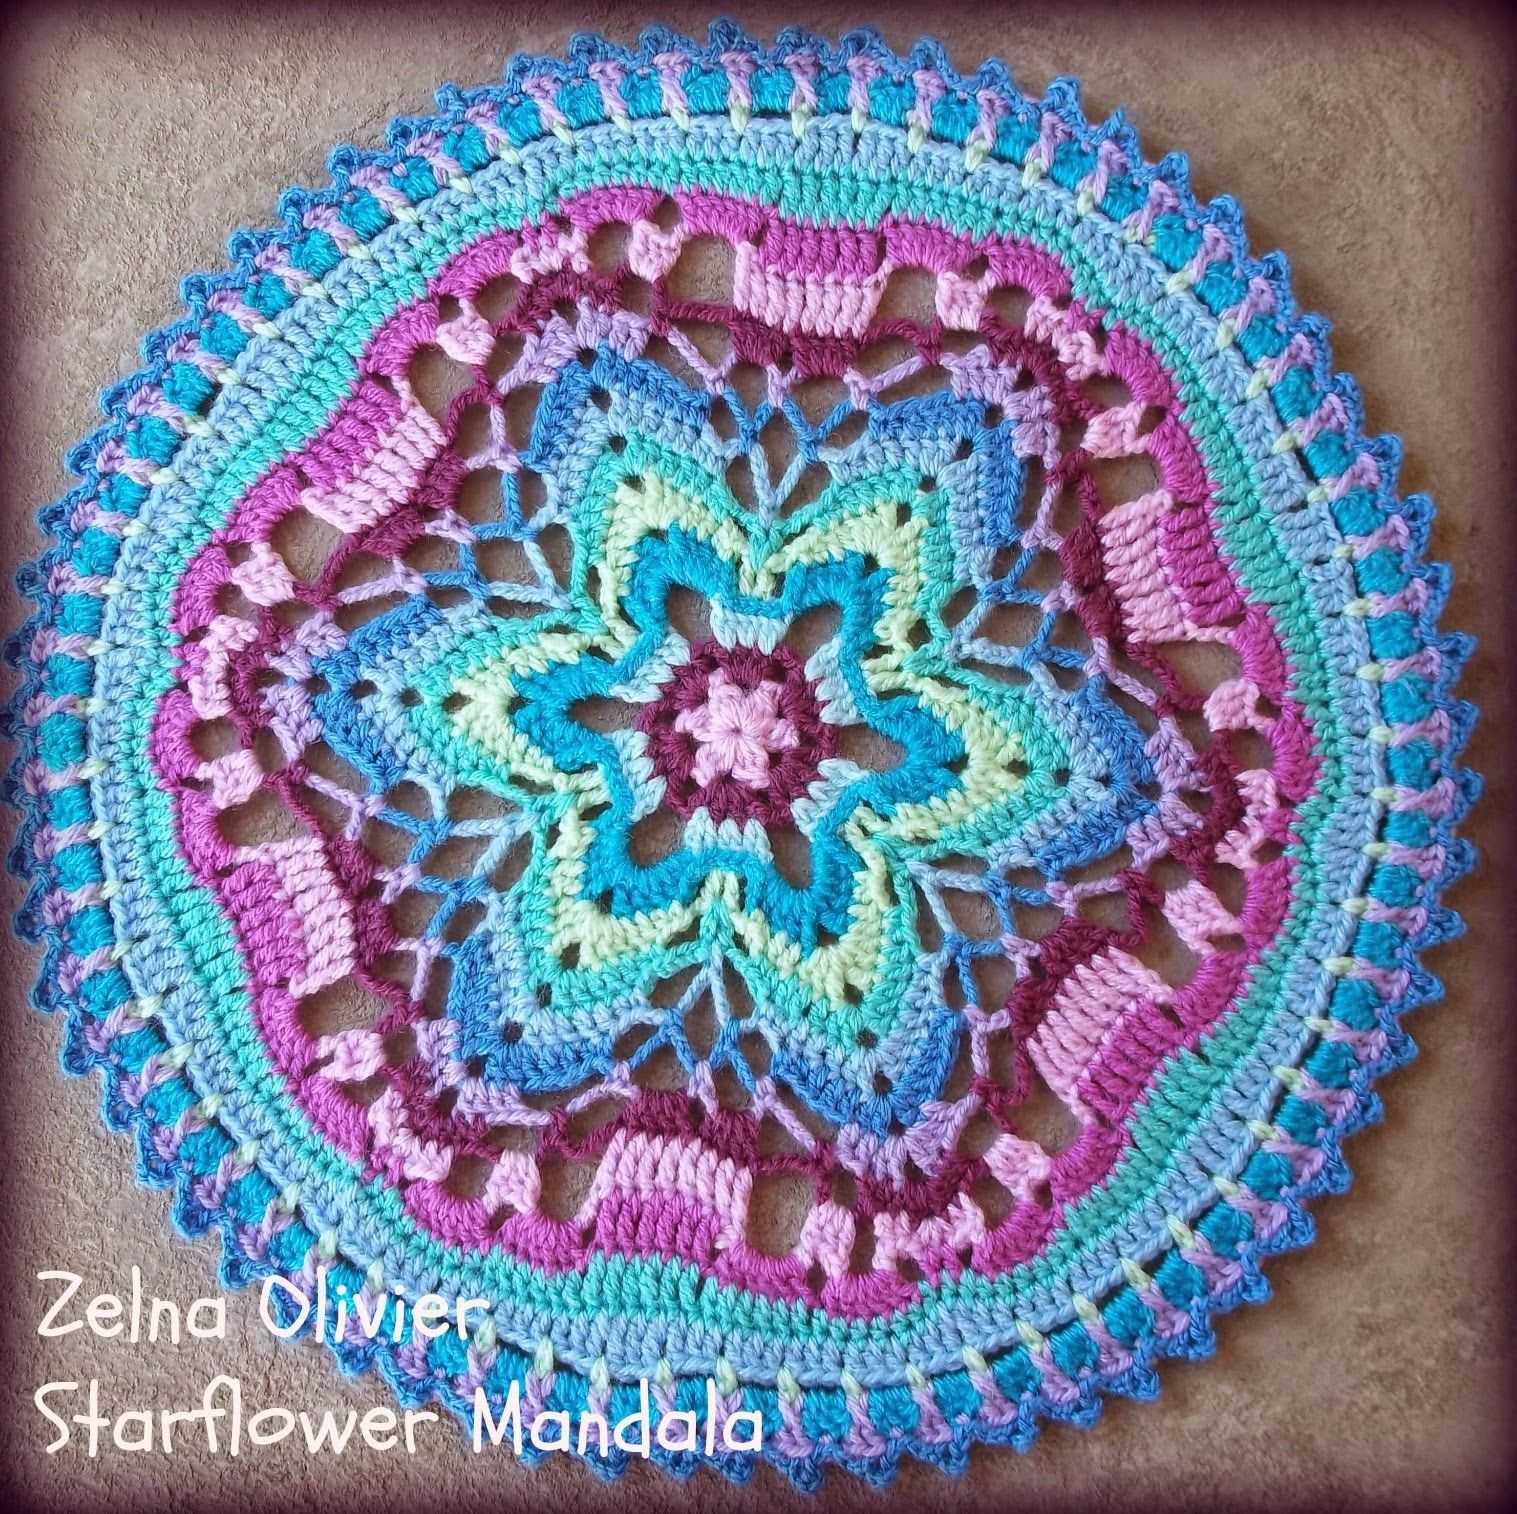 Starflower Mandala Pattern Zierdeckchenmuster Mandalas